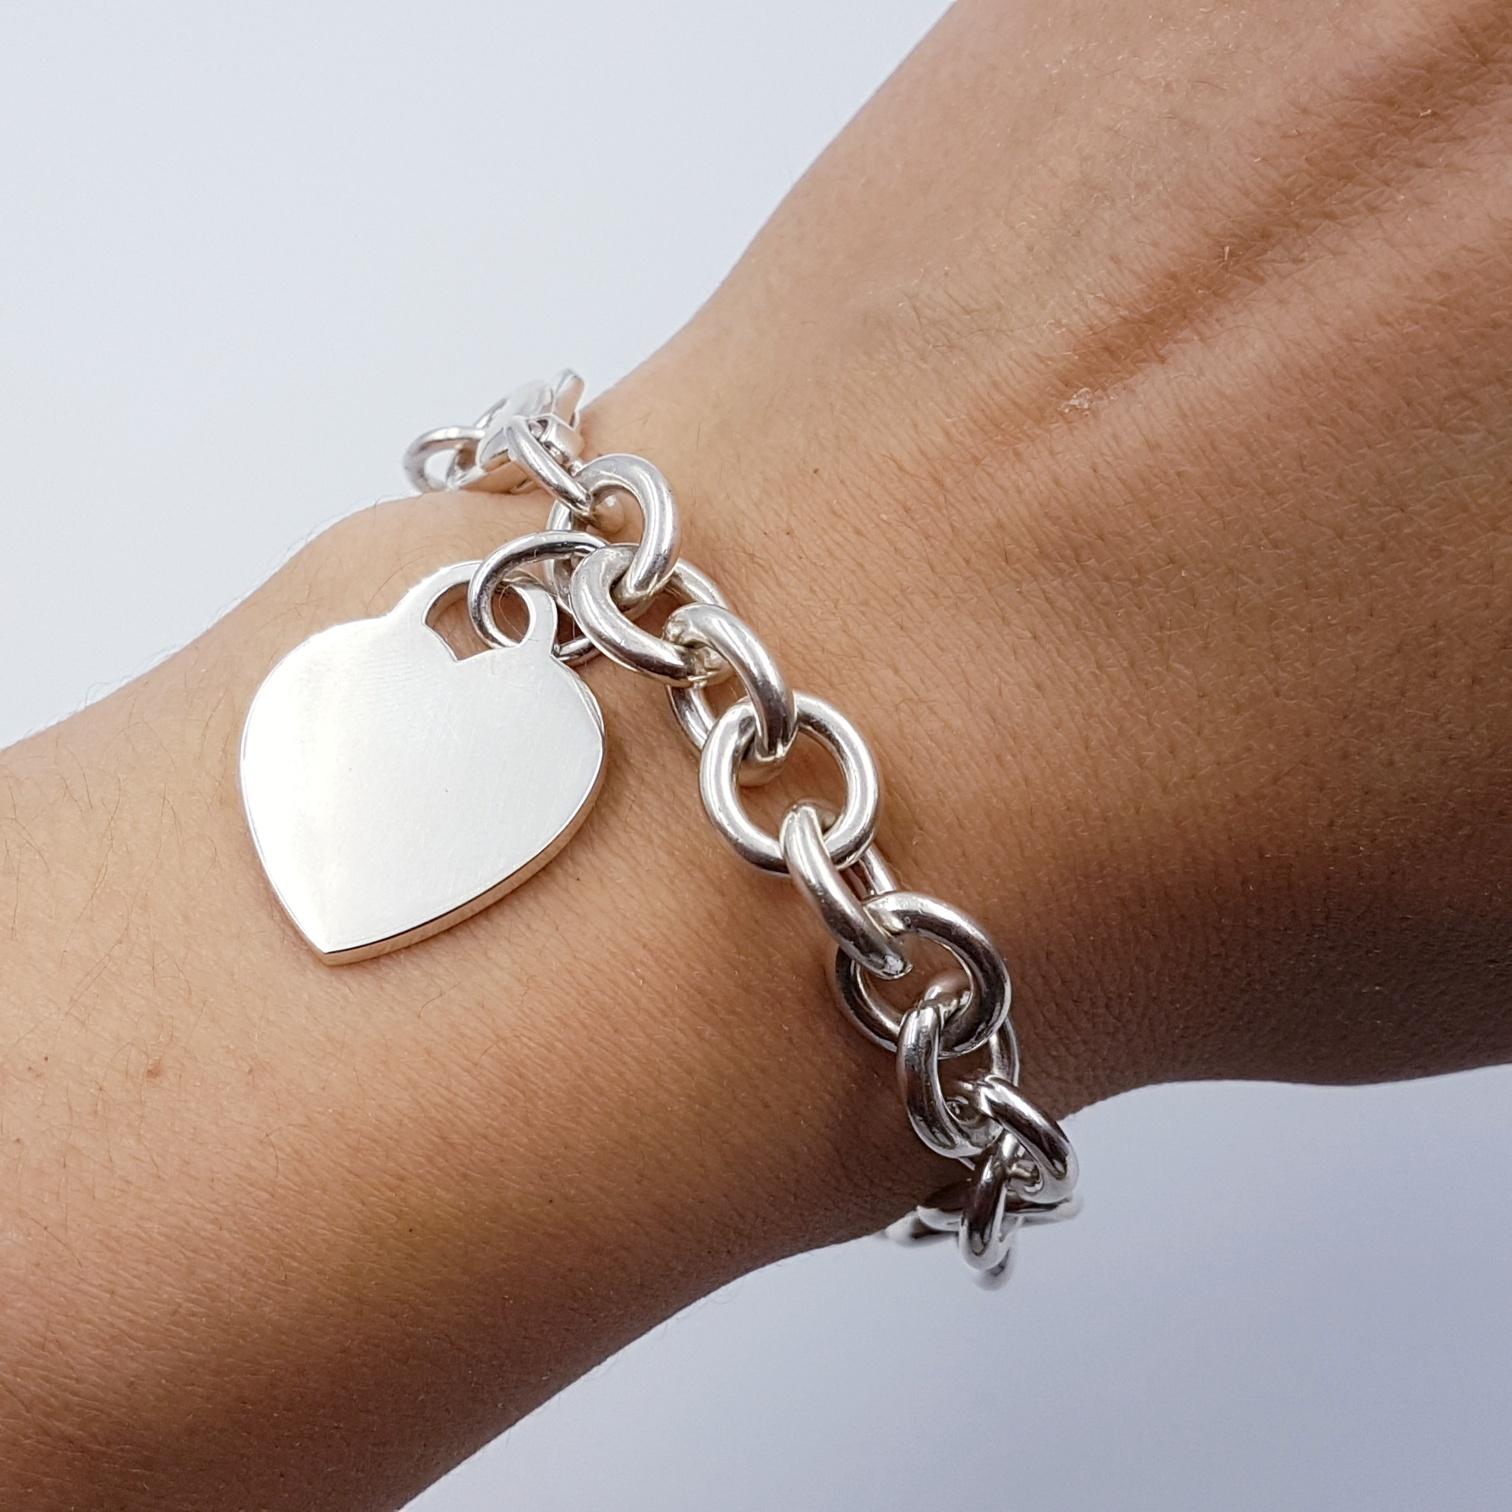 <b>Tiffany & Co.</b> Engravable Heart Charm Bracelet 7.5